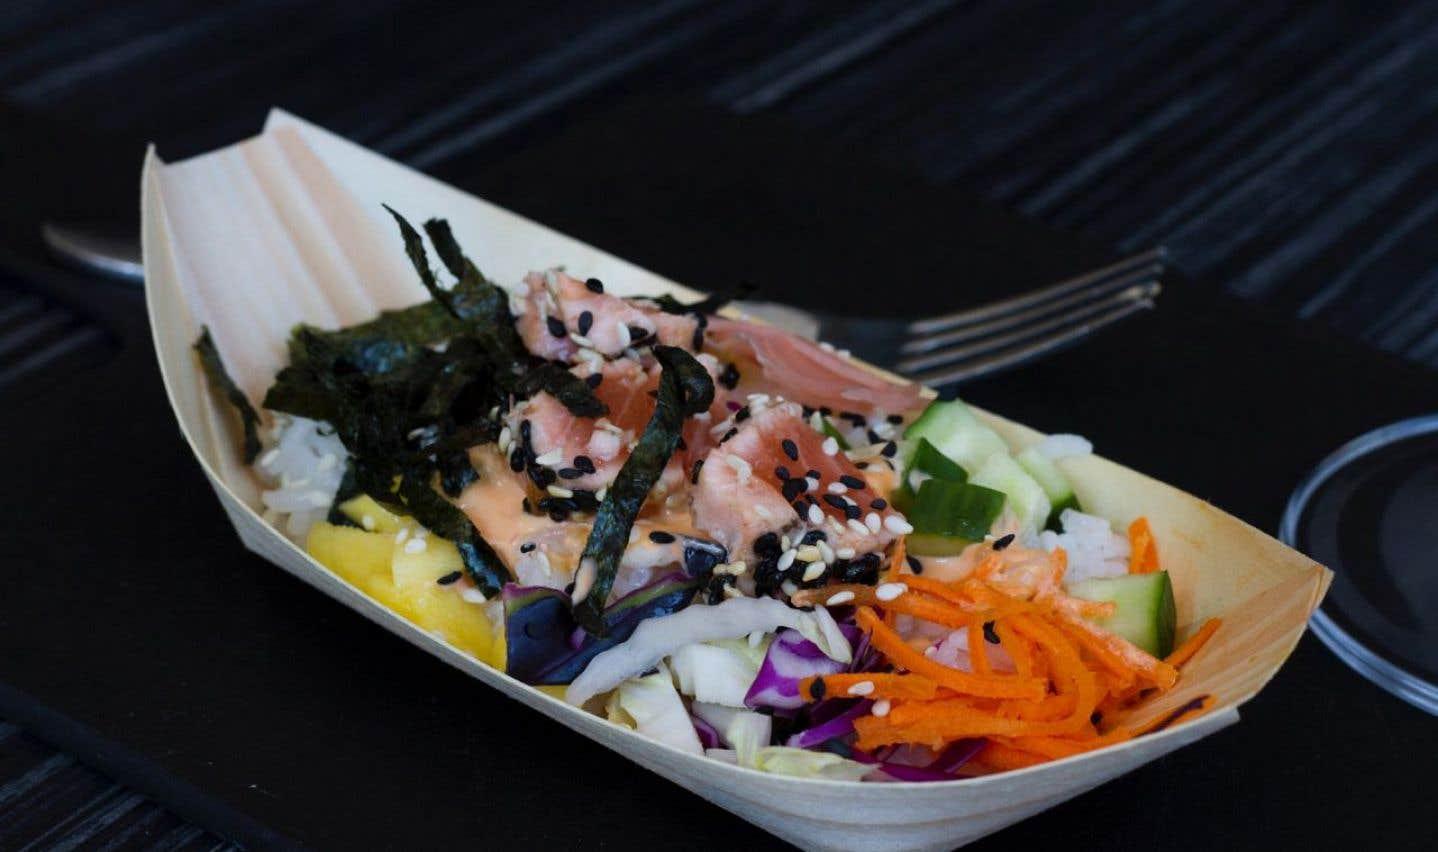 La recette du bol Poke au saumon de Kimberly Lallouz